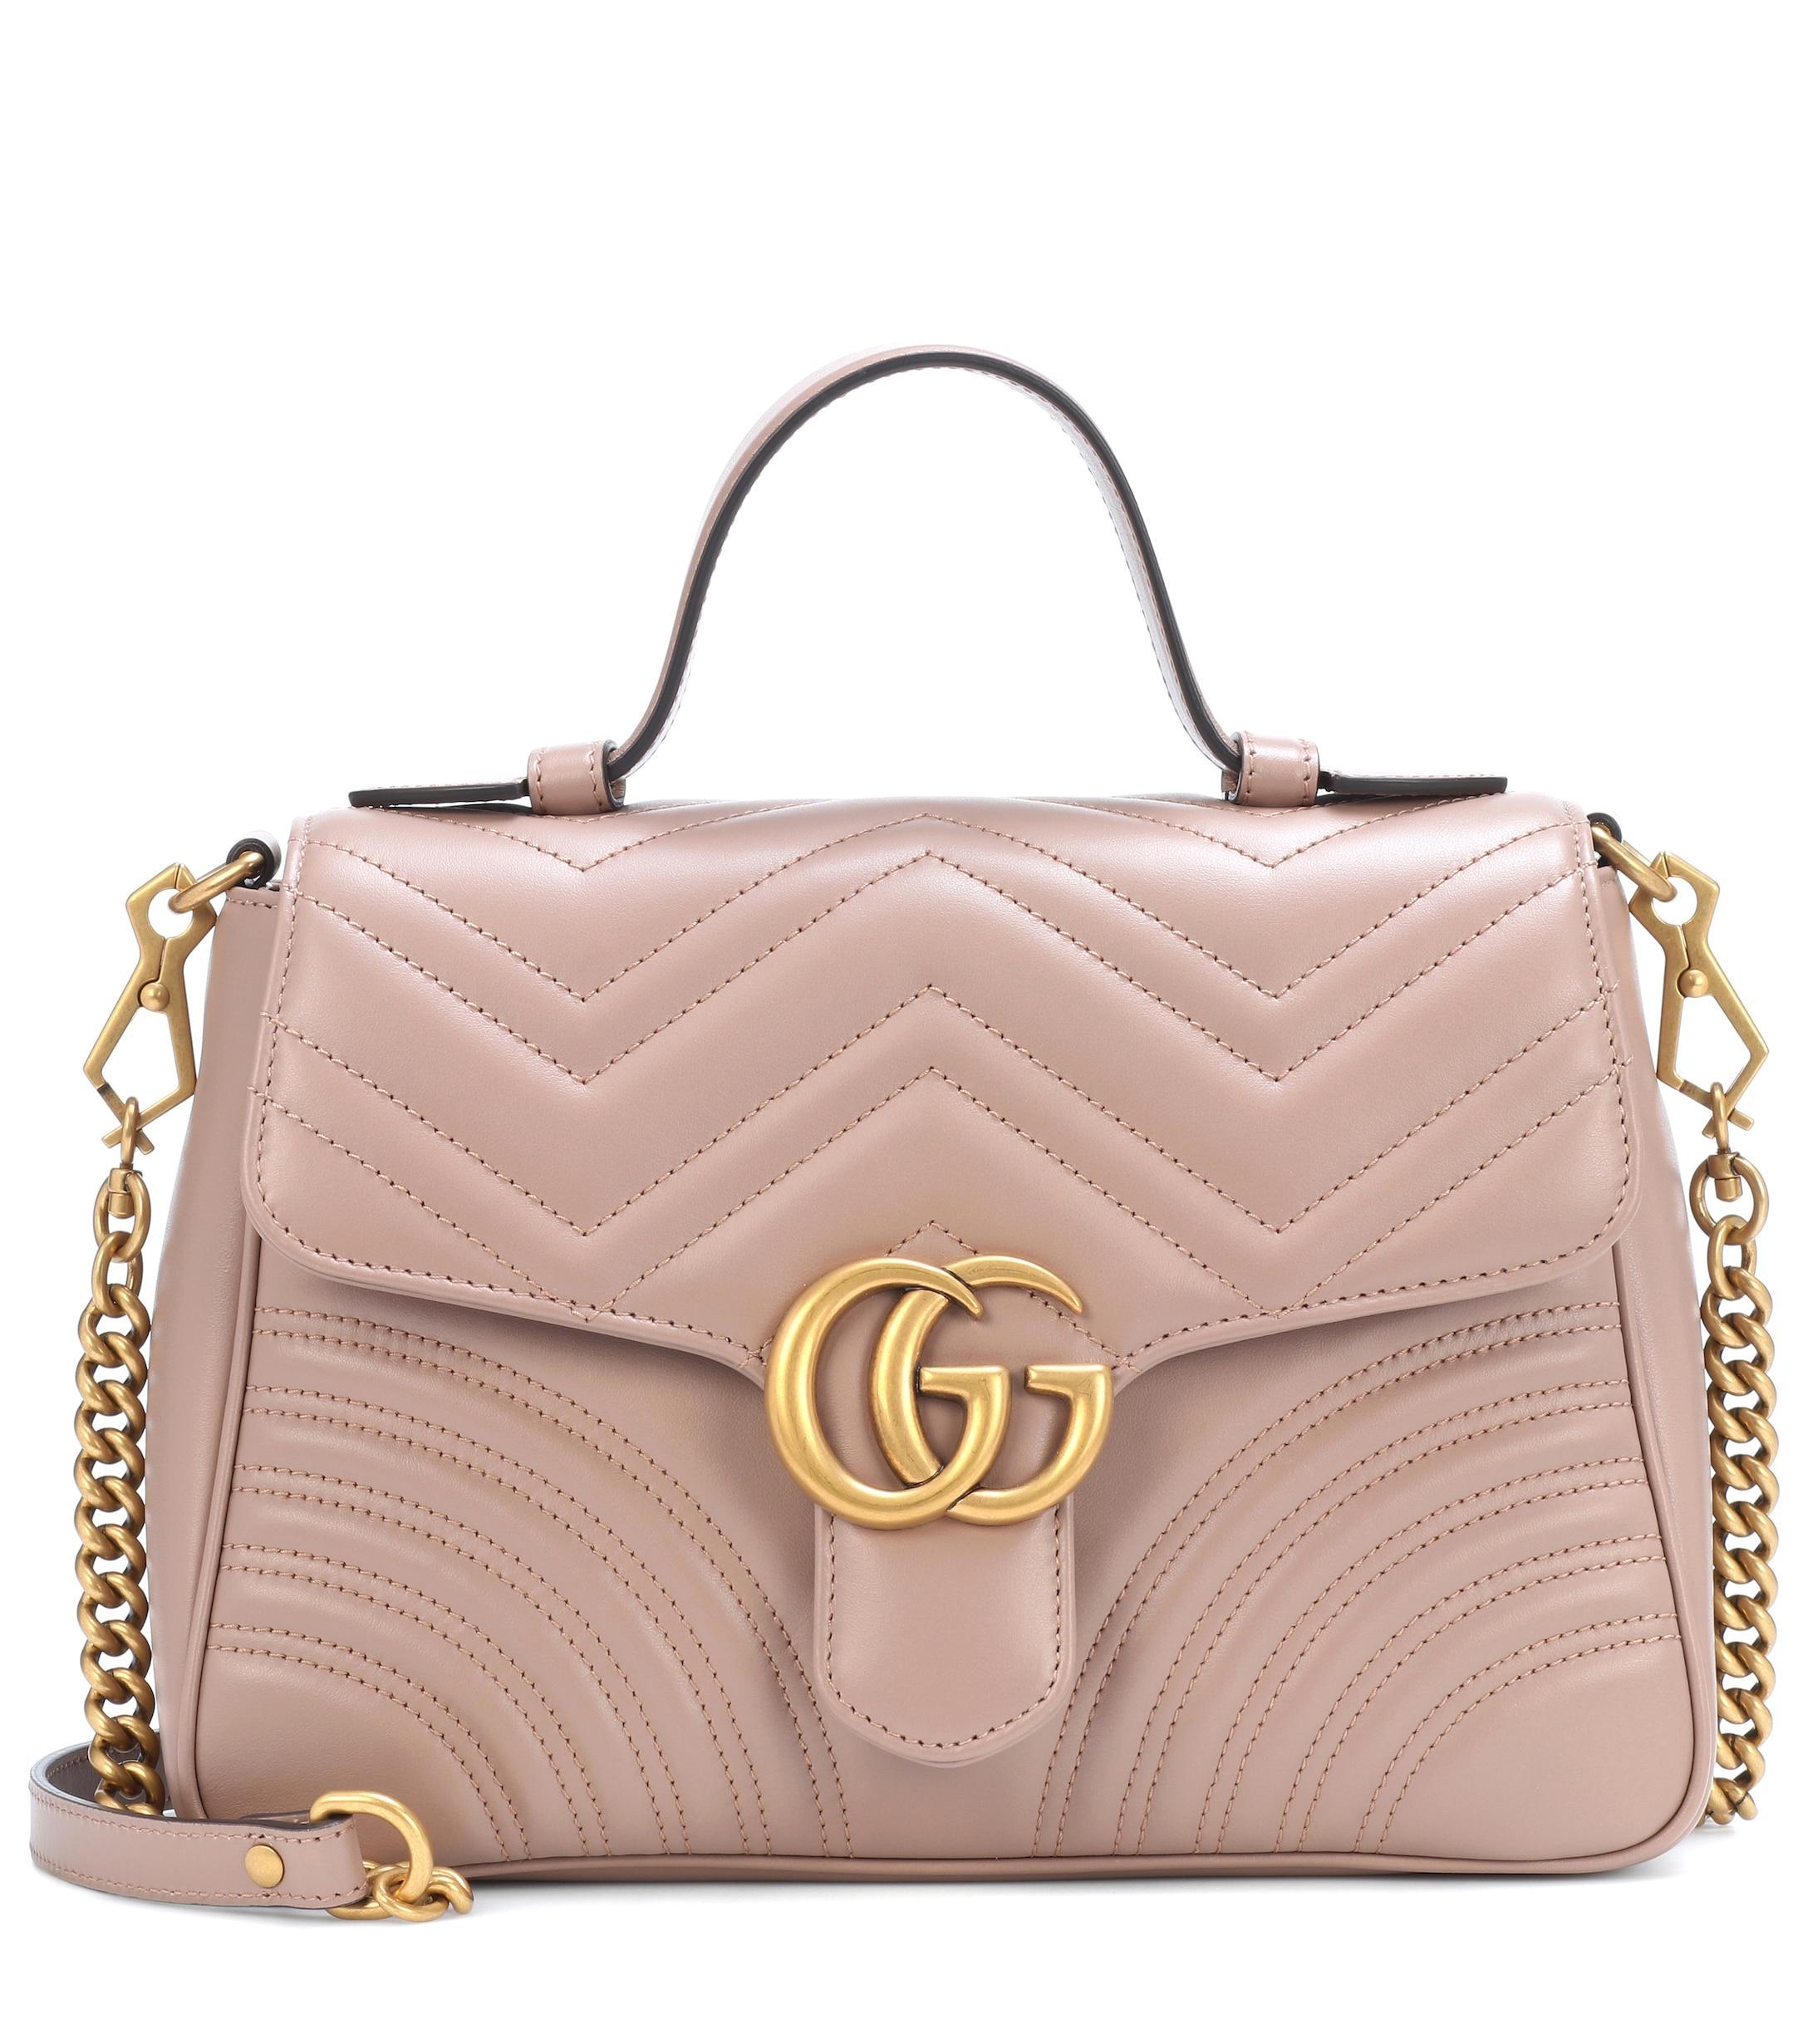 404b387ebbf Gucci. Women s GG Marmont Small Shoulder Bag